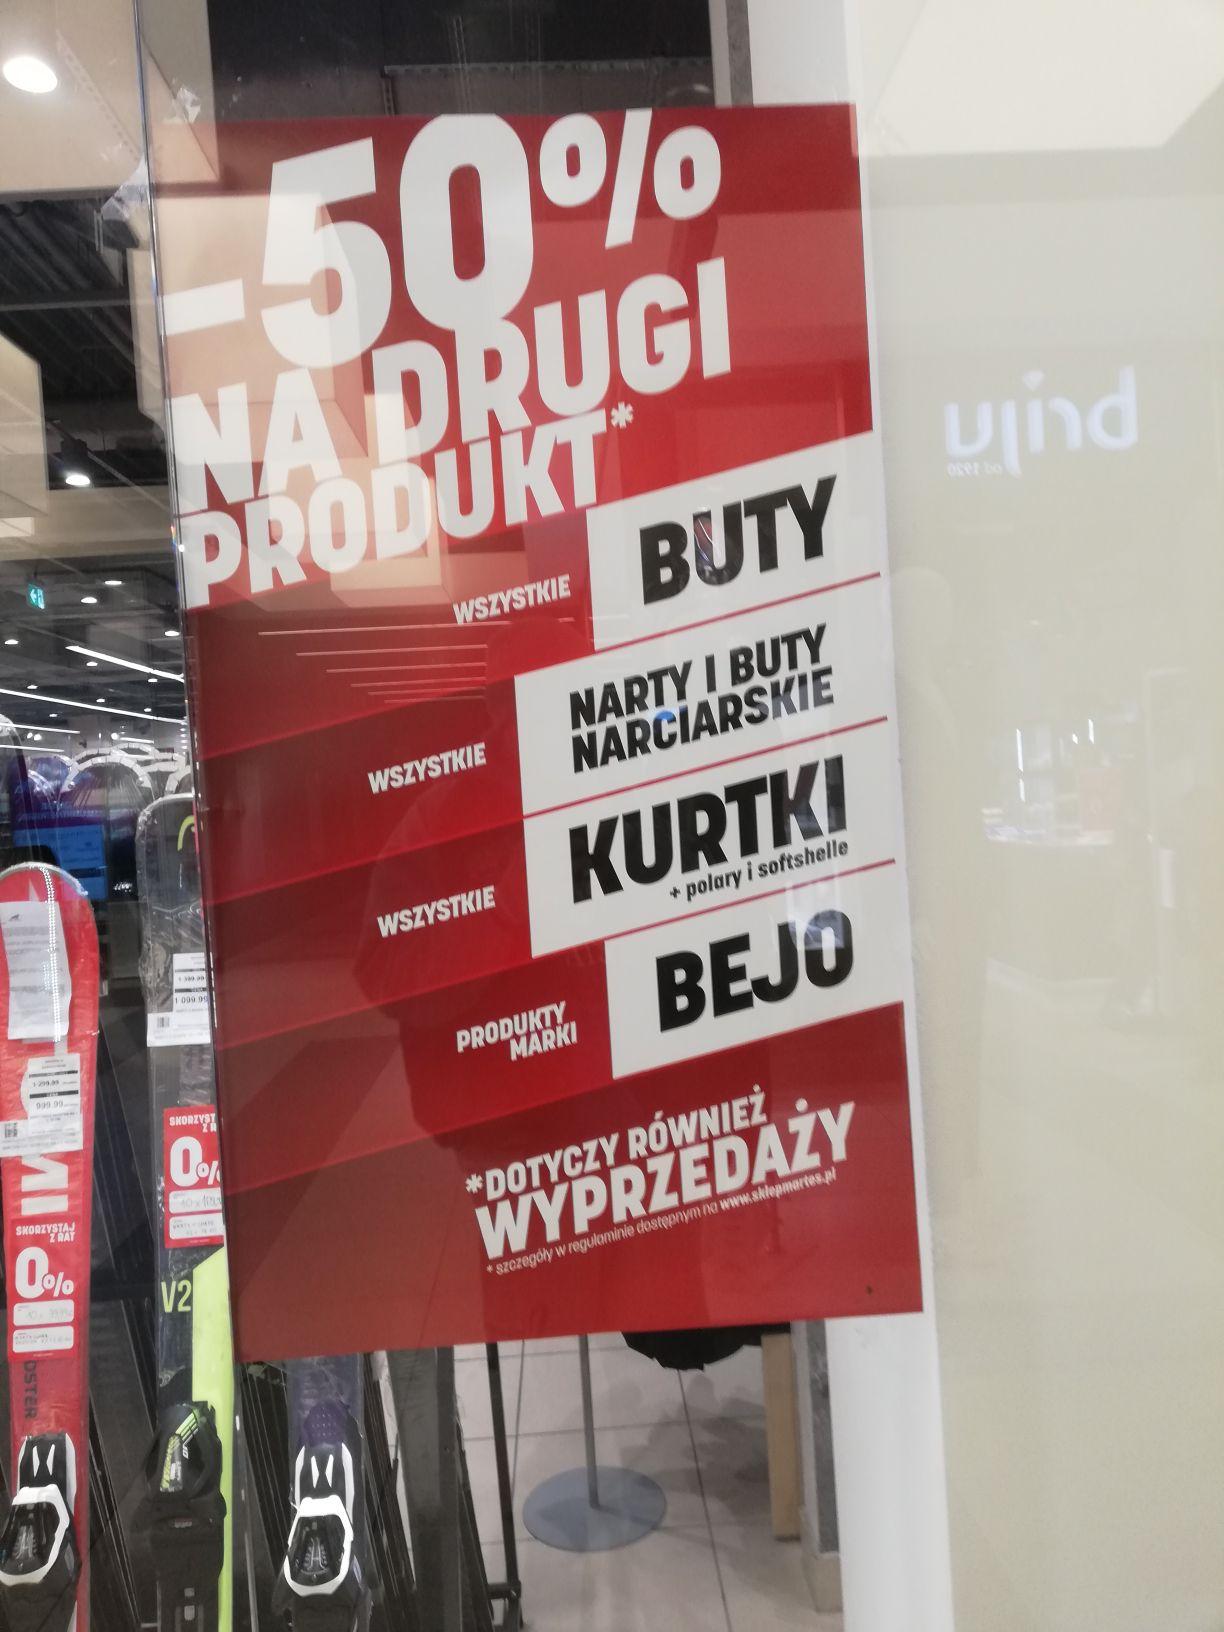 Martes Sport - 50% na drugi produkt - tylko sklepy stacjonarne